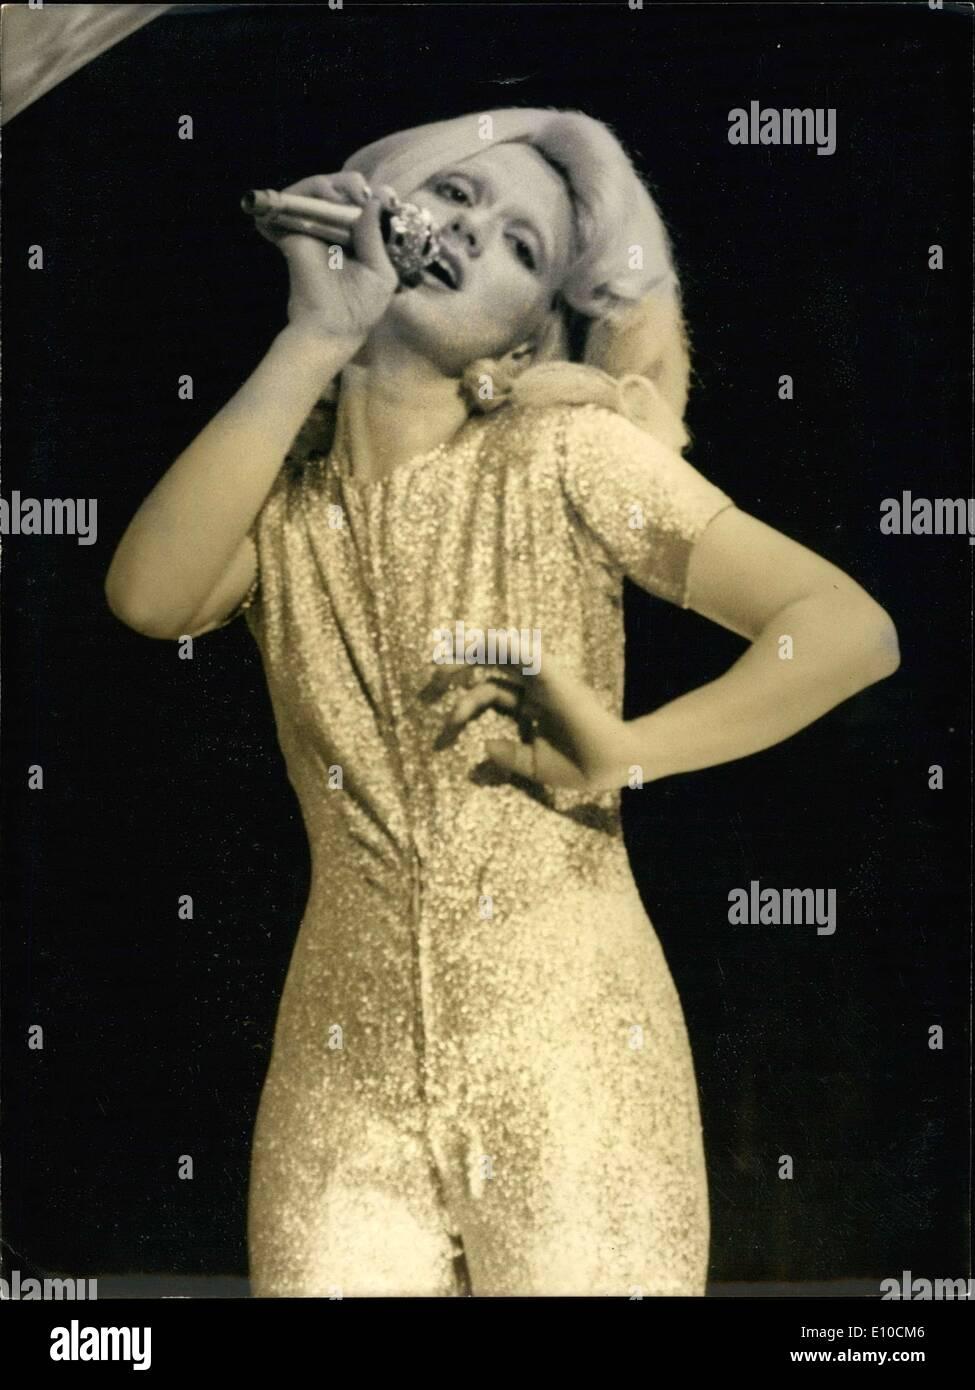 Jun. 10, 1972 - During the TV program ''Entente Coridale'' Rita Pavone impersonates the French singer Sylvie Vartan. - Stock Image